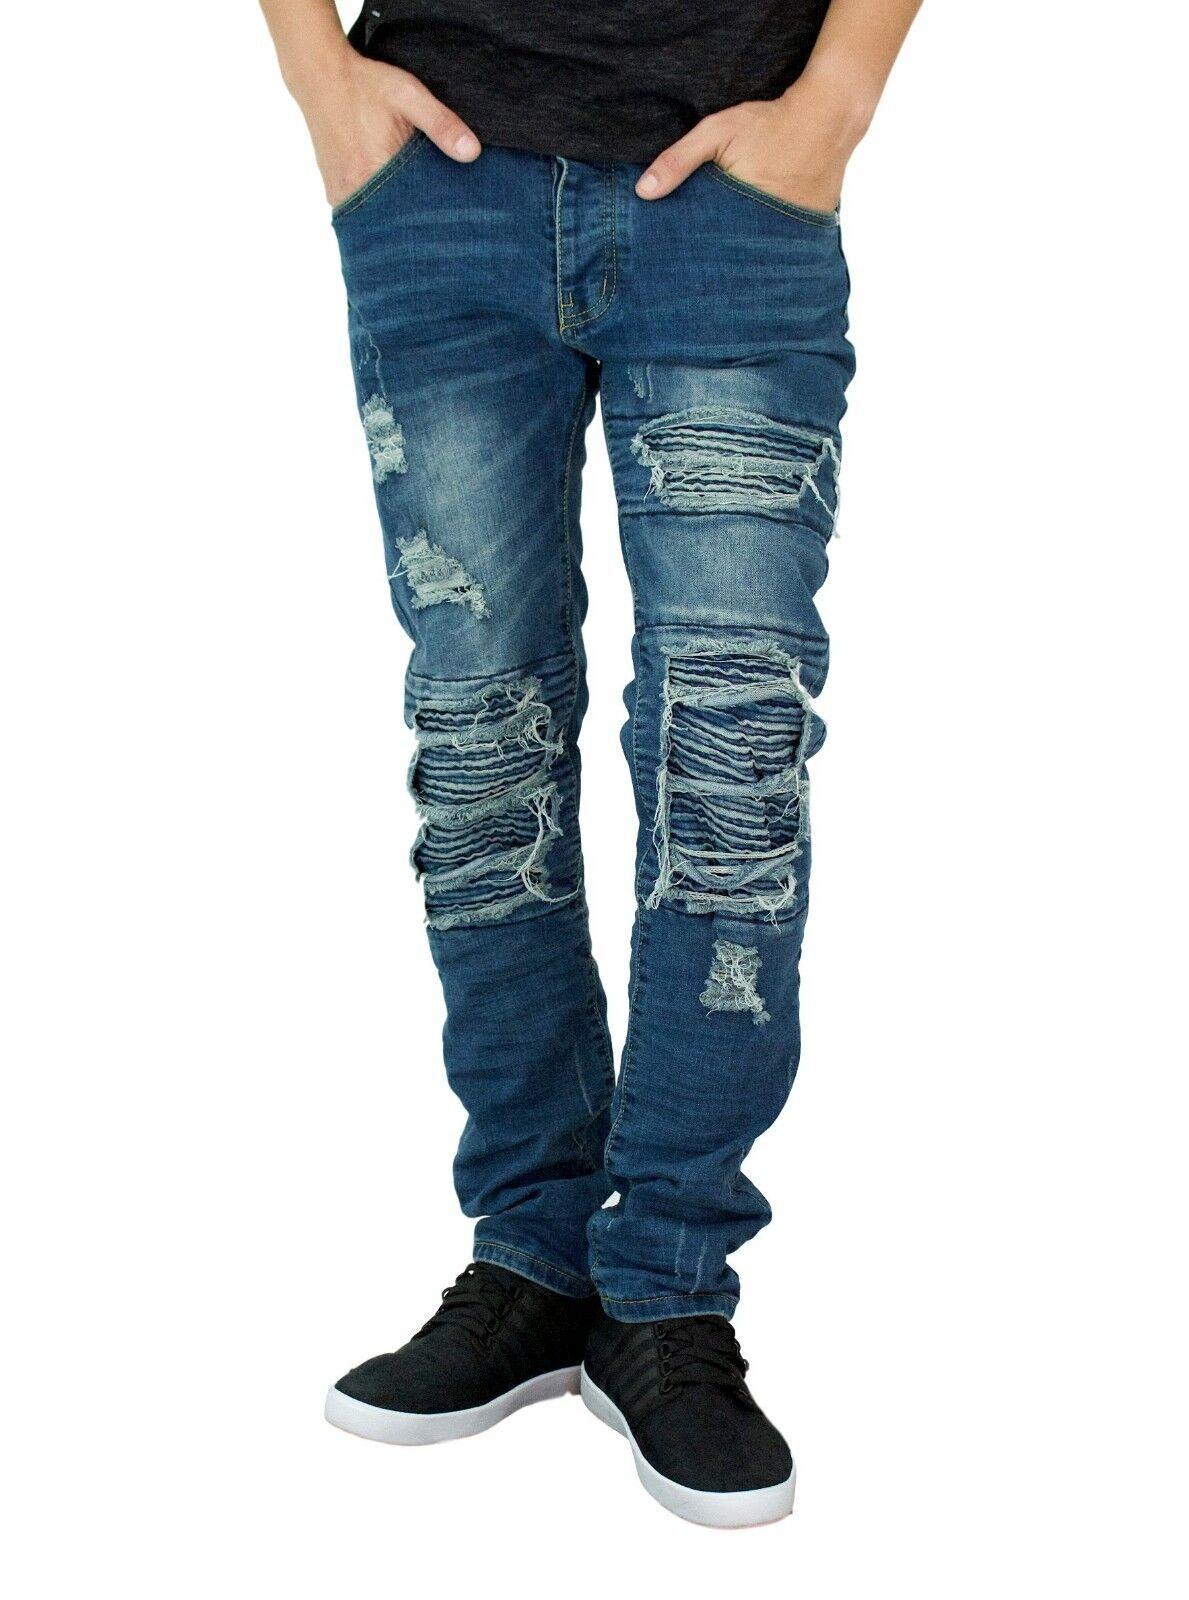 Men's biker Skinny jeans, premium Ripped Distressed stretch